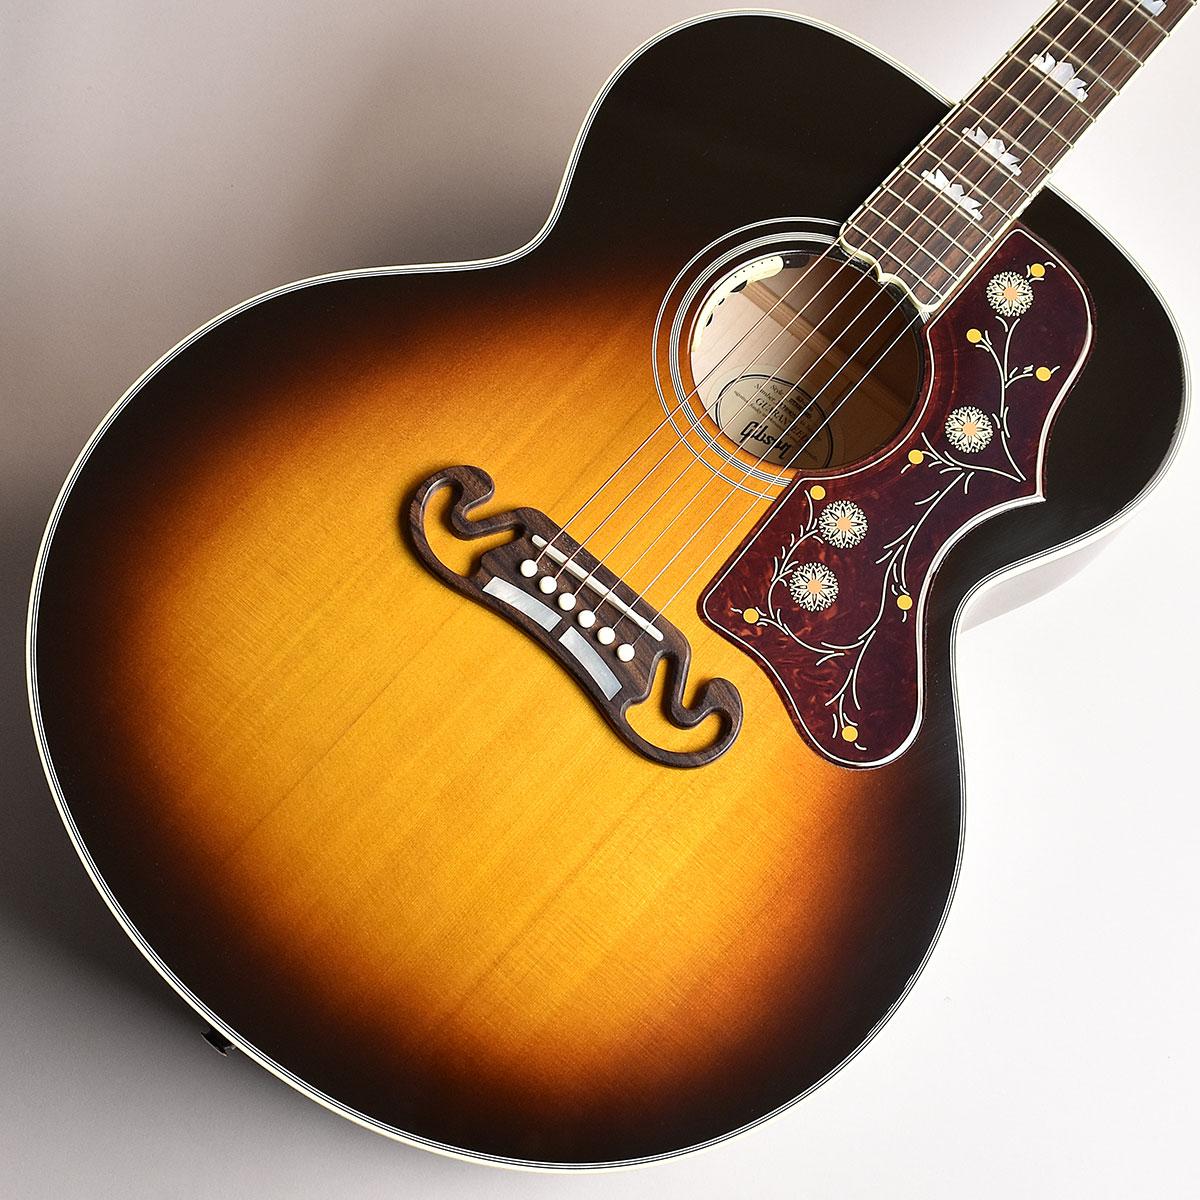 Gibson J-200 Standard 2019 Vintage Sunburst S/N:11789052 エレアコ 【ギブソン J200】【未展示品】